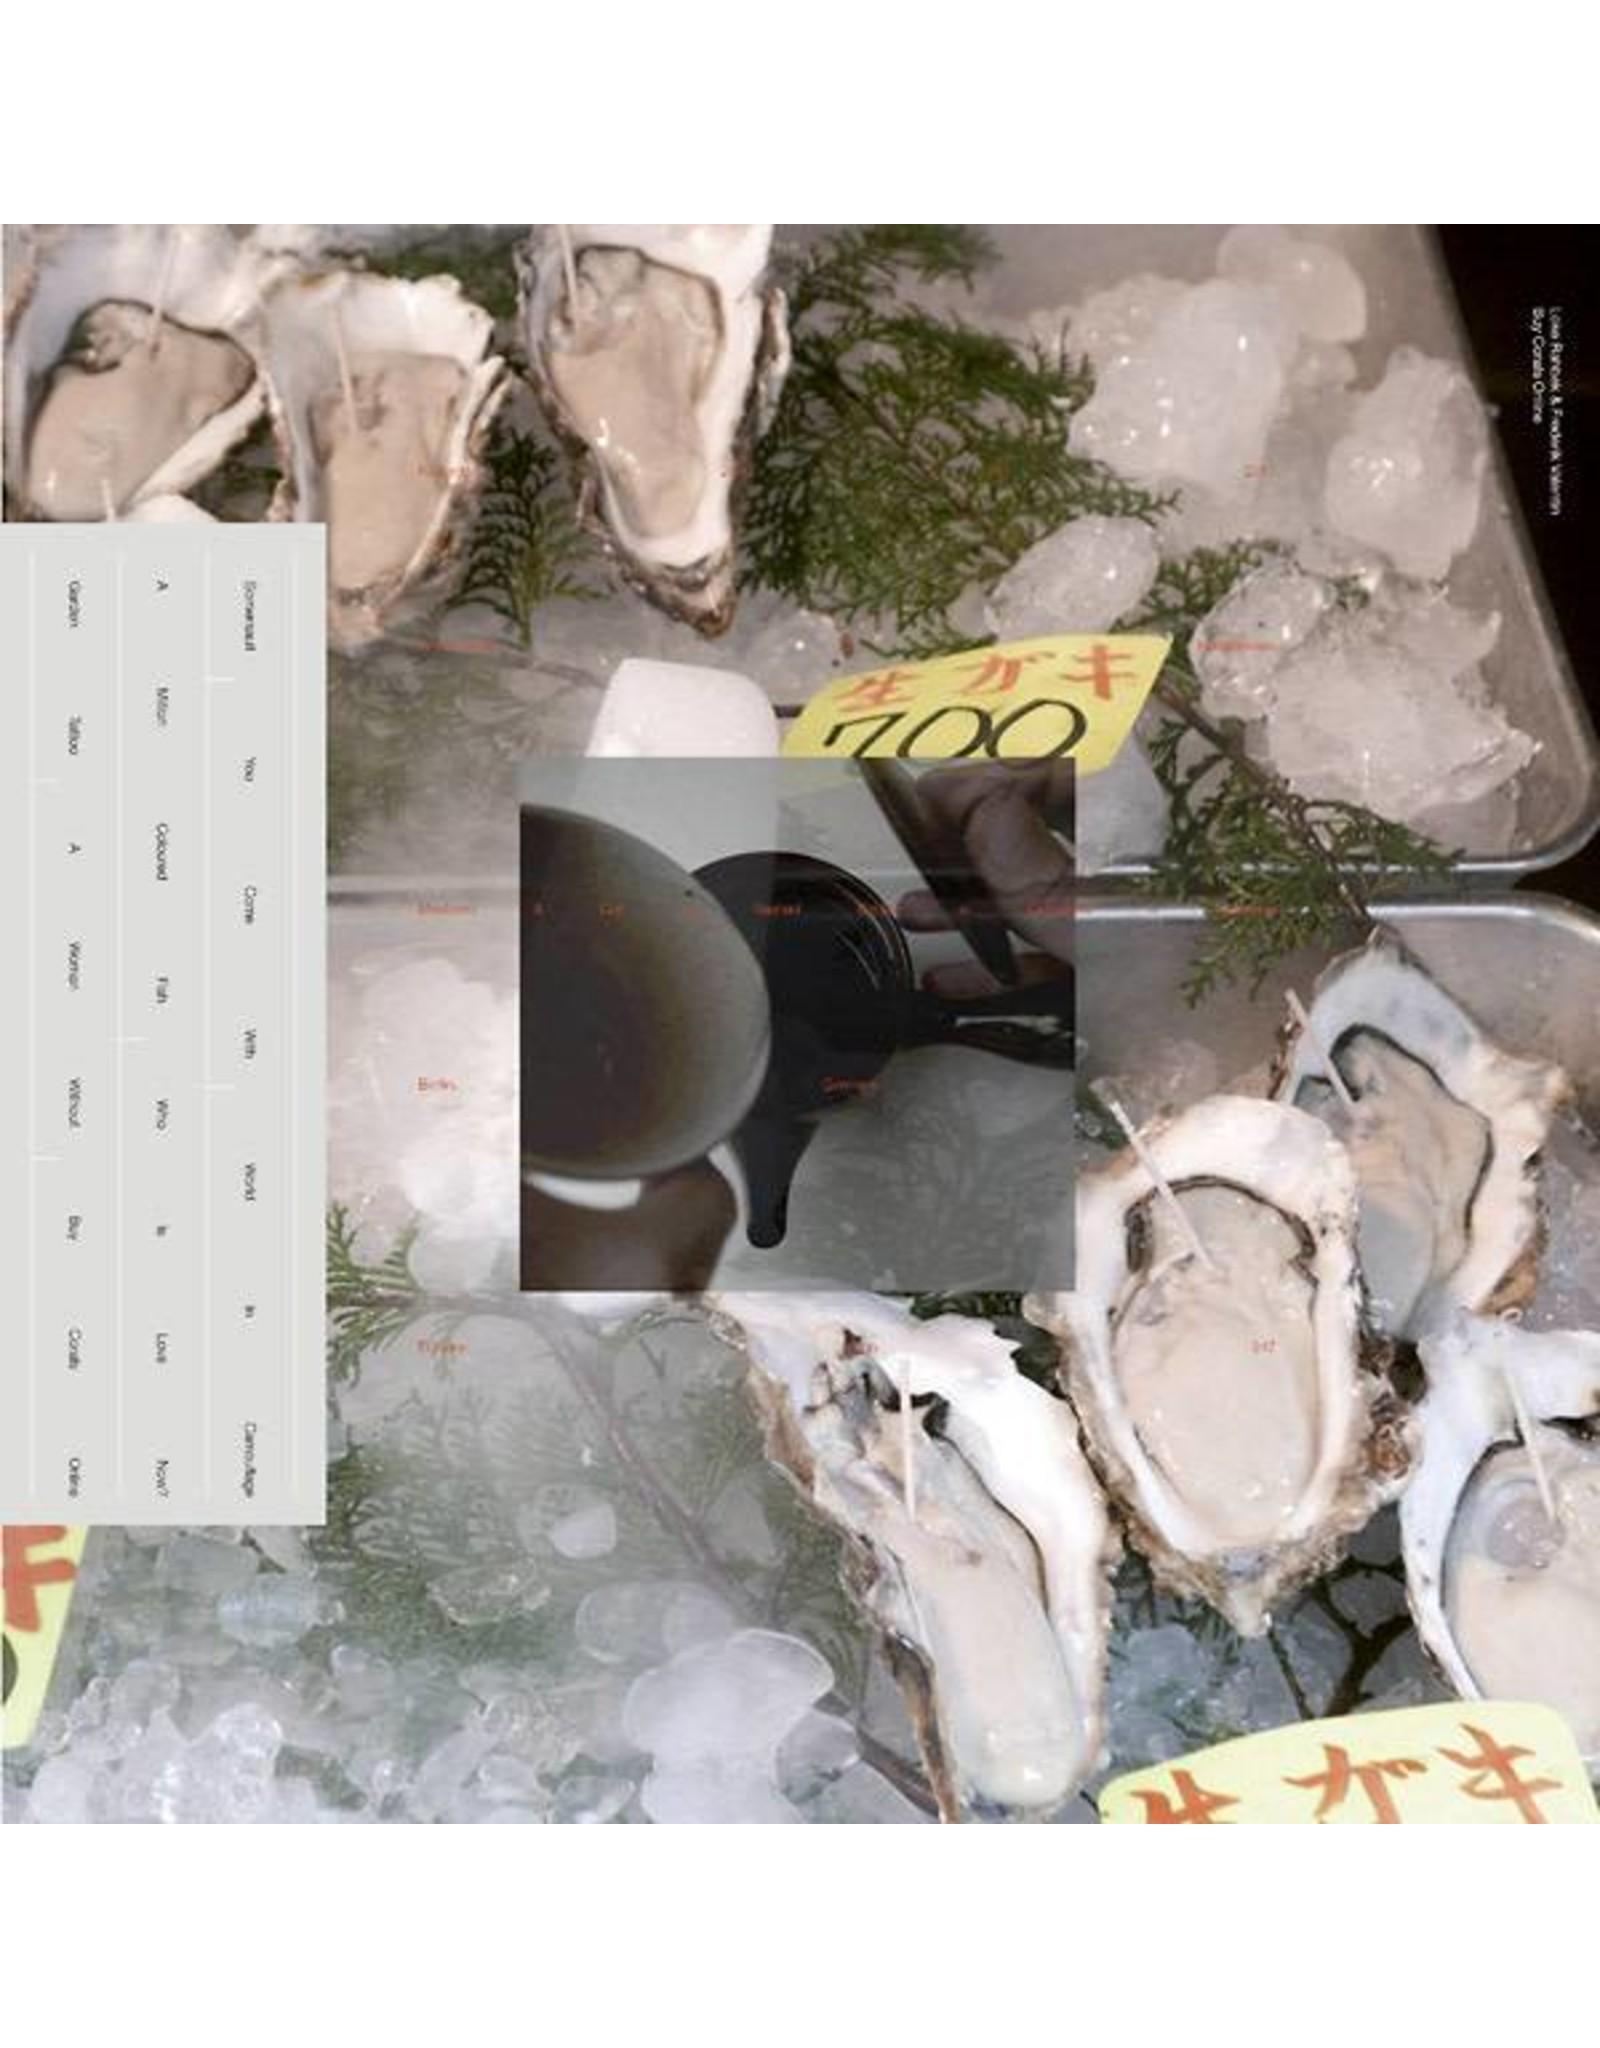 Editions Mego Rahbek/Valentin: Buy Corals Online LP